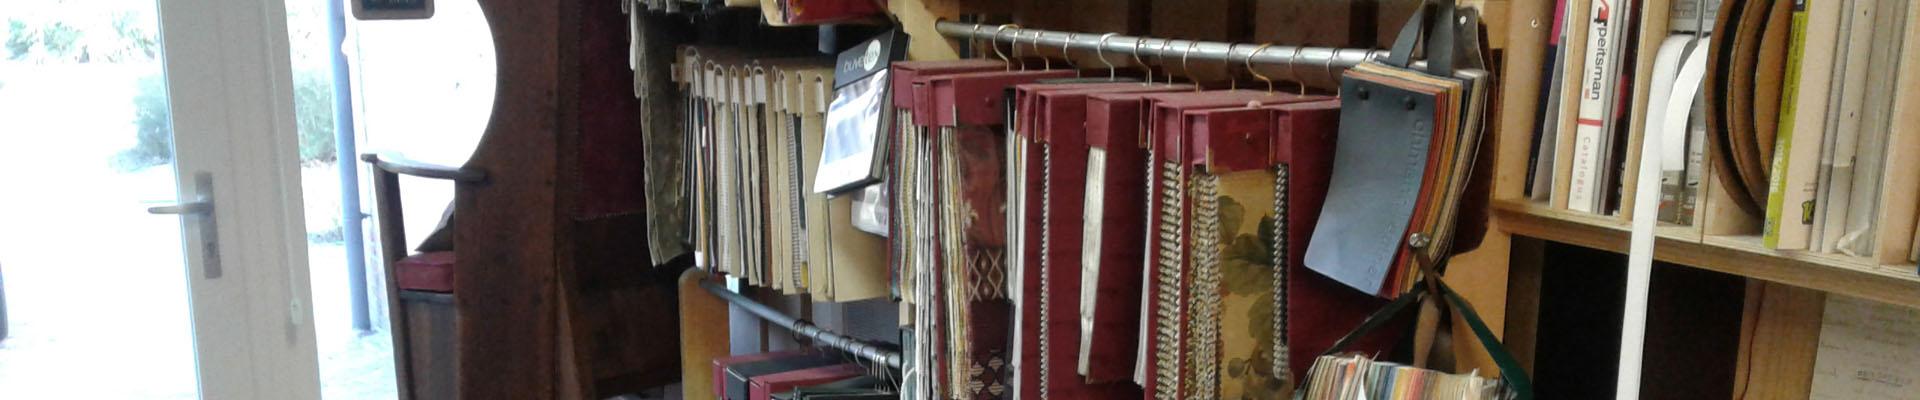 stof-stalen-meubelstoffeerderij-op-en-nij